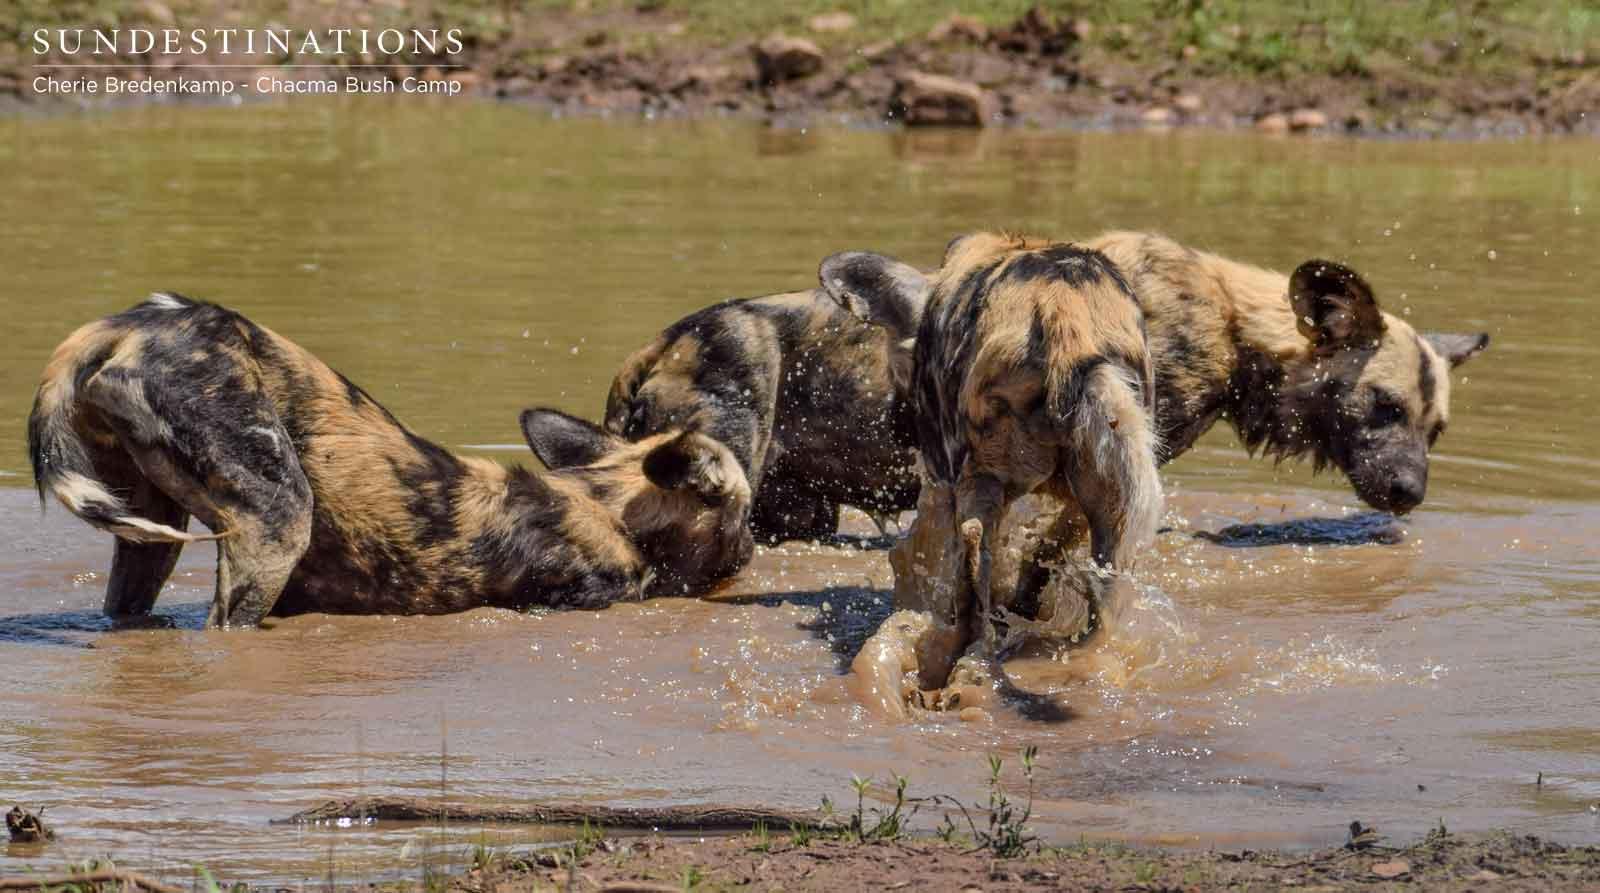 Chacma Bush Camp Wild Dogs